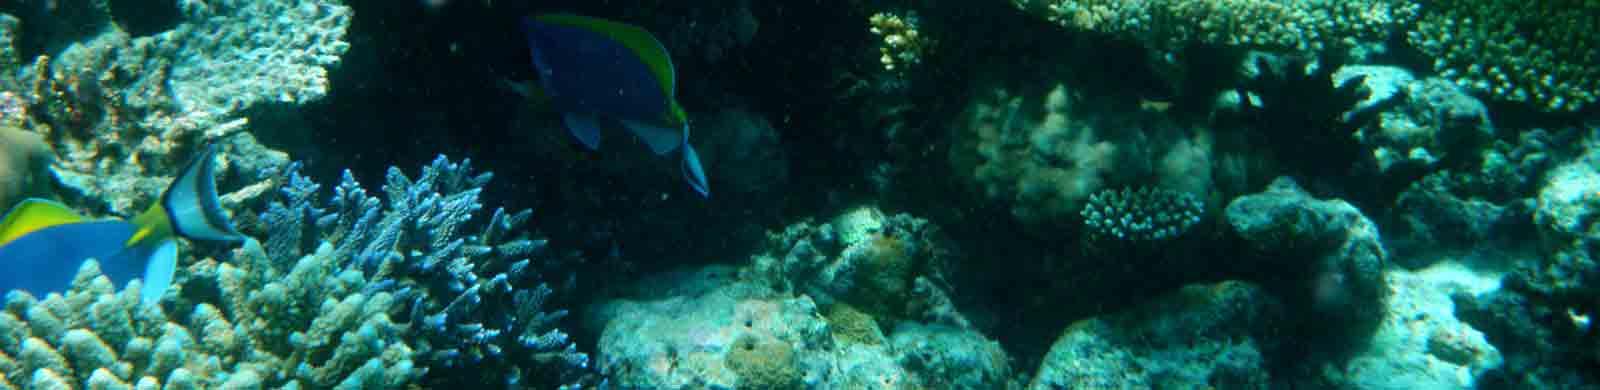 underwater scene byron coaching